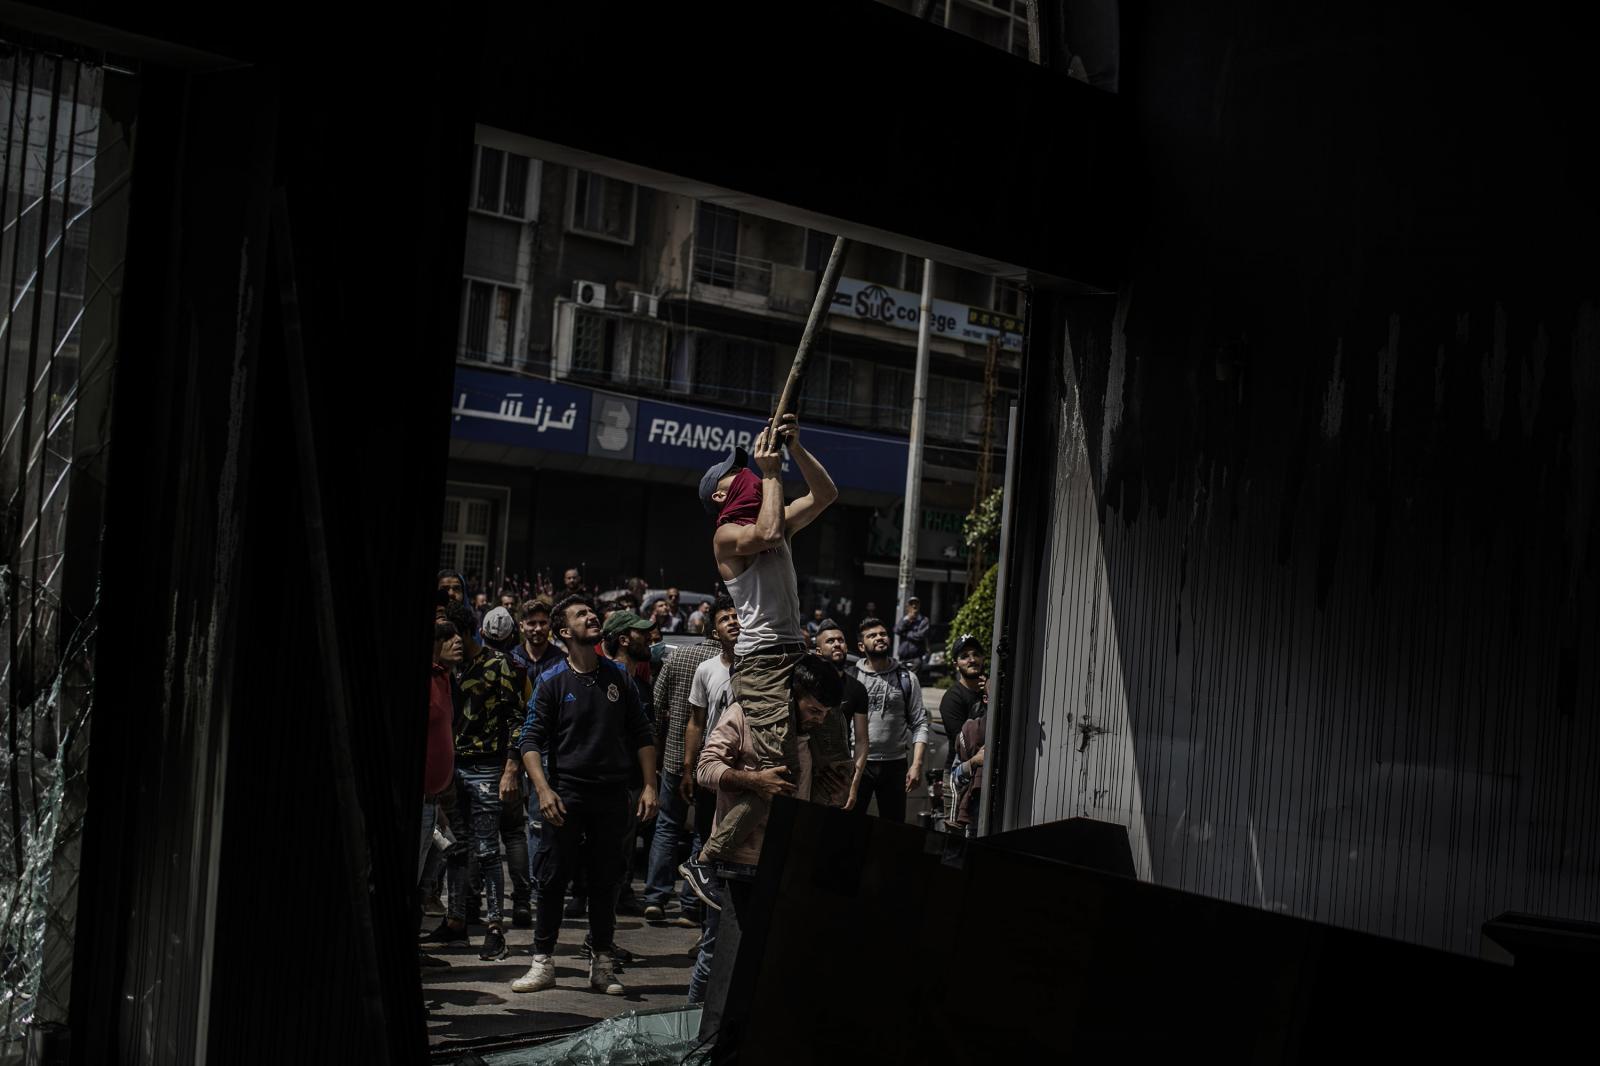 Photography image - Loading CNN_TRIPOLI_DiegoIbarraSanchez_002.jpg